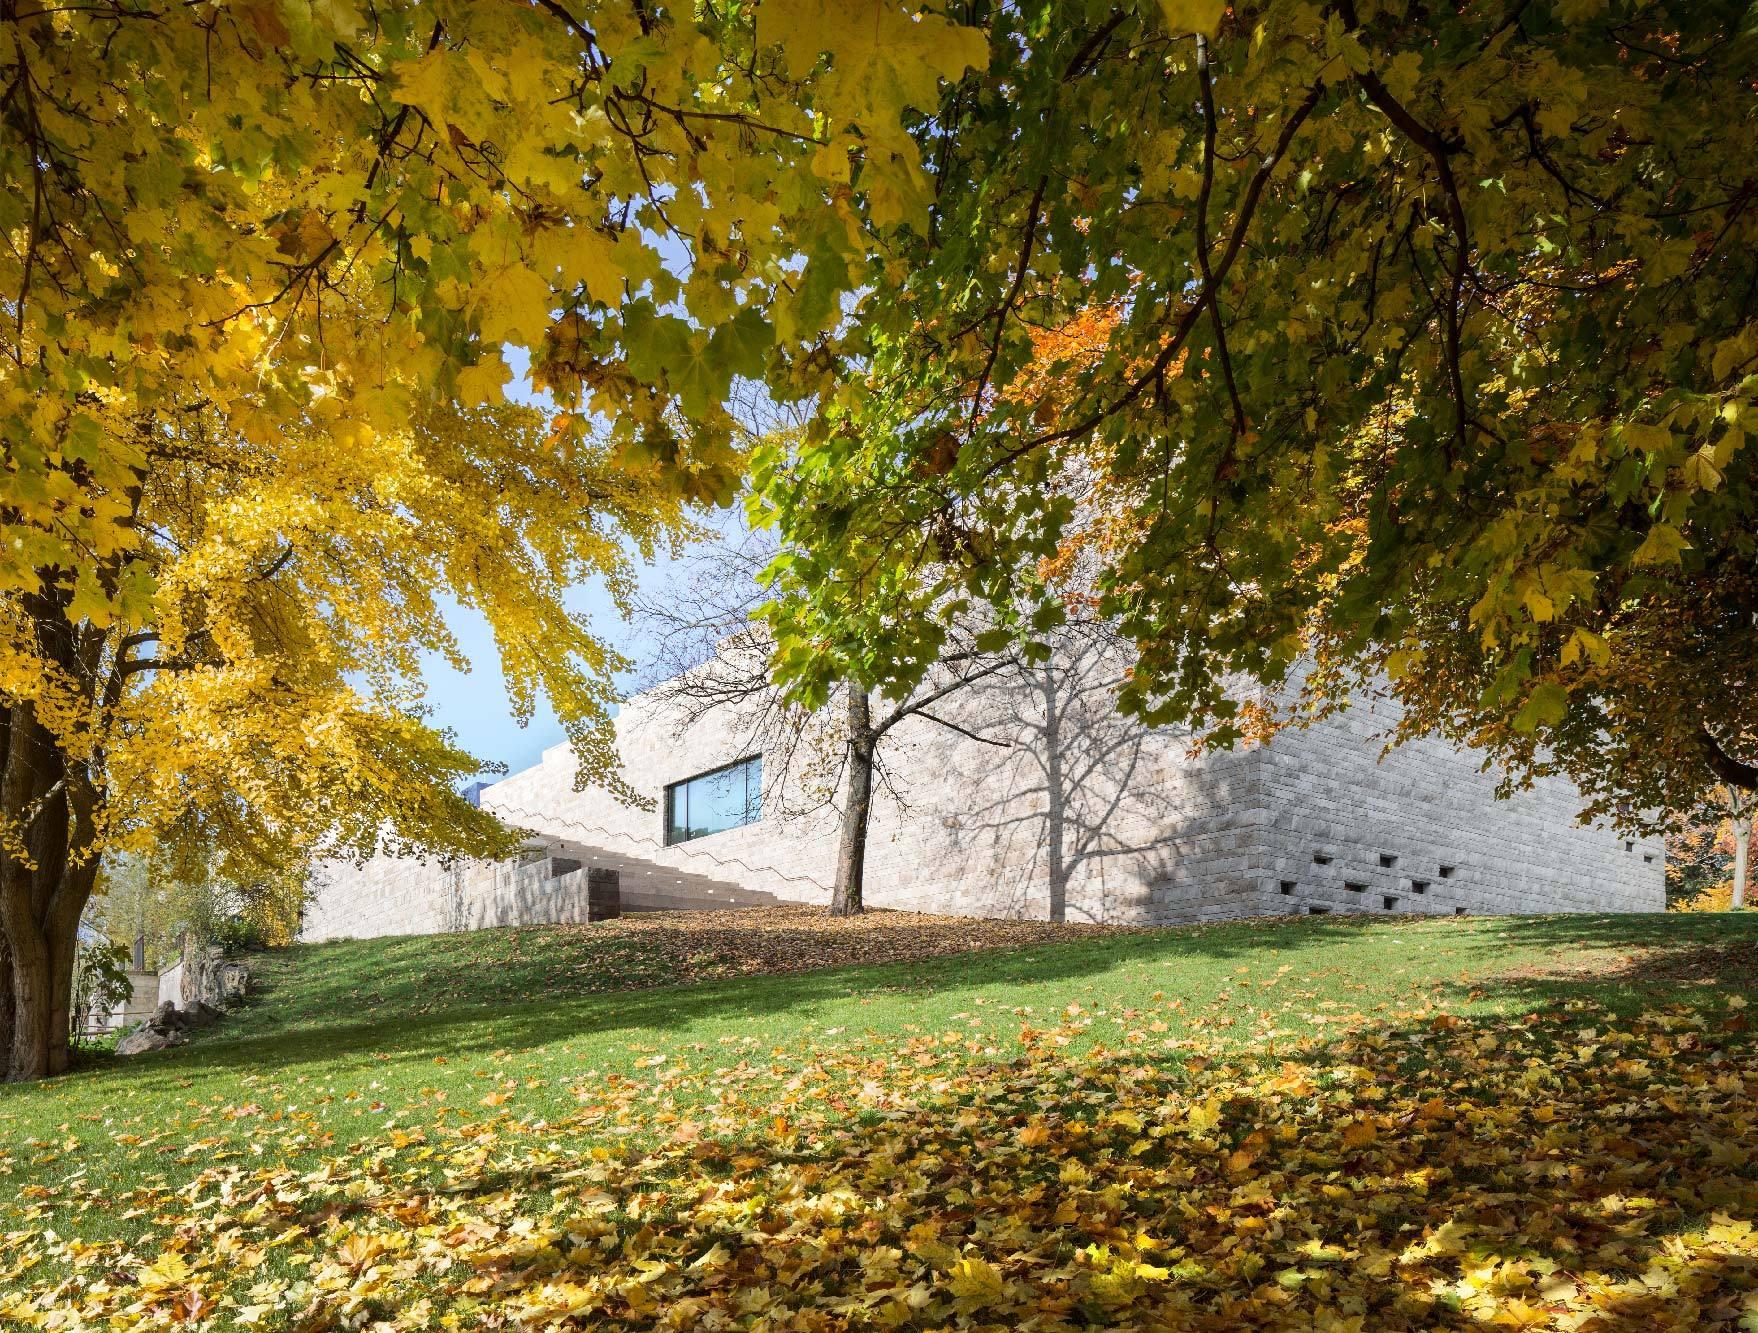 kada wittfeld architekten - Grimmwelt museum kassel